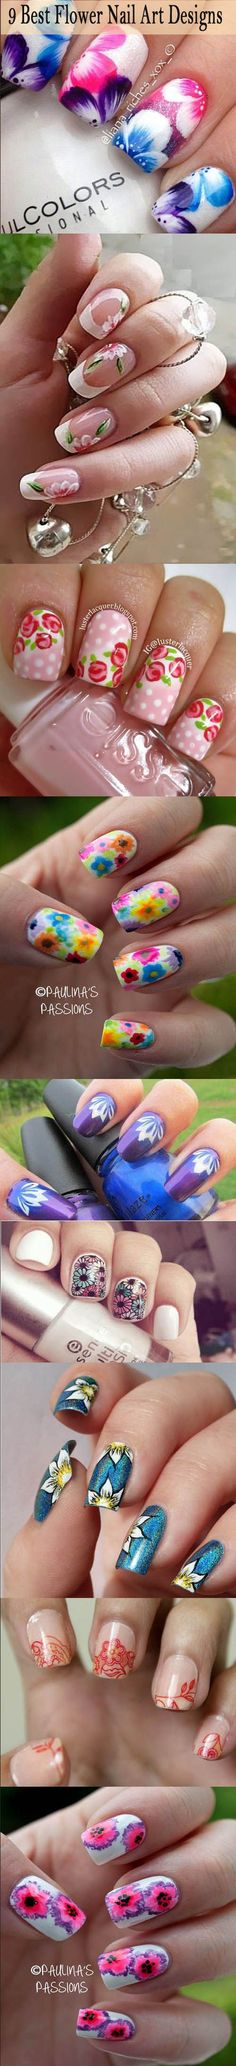 9 Best Flower Nail Art Designs<3<3<3